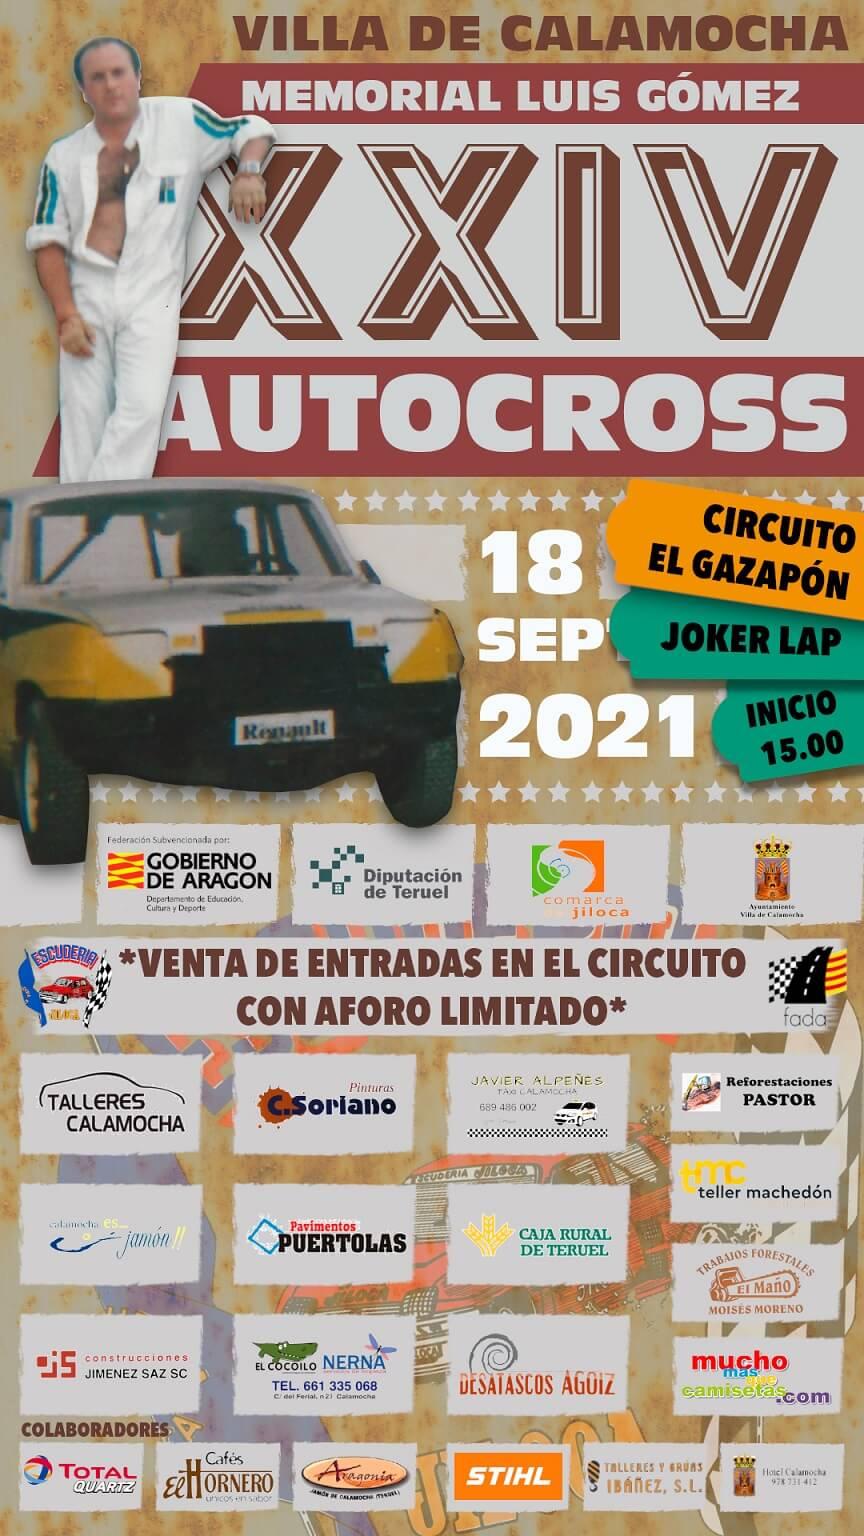 Autocross en Calamocha